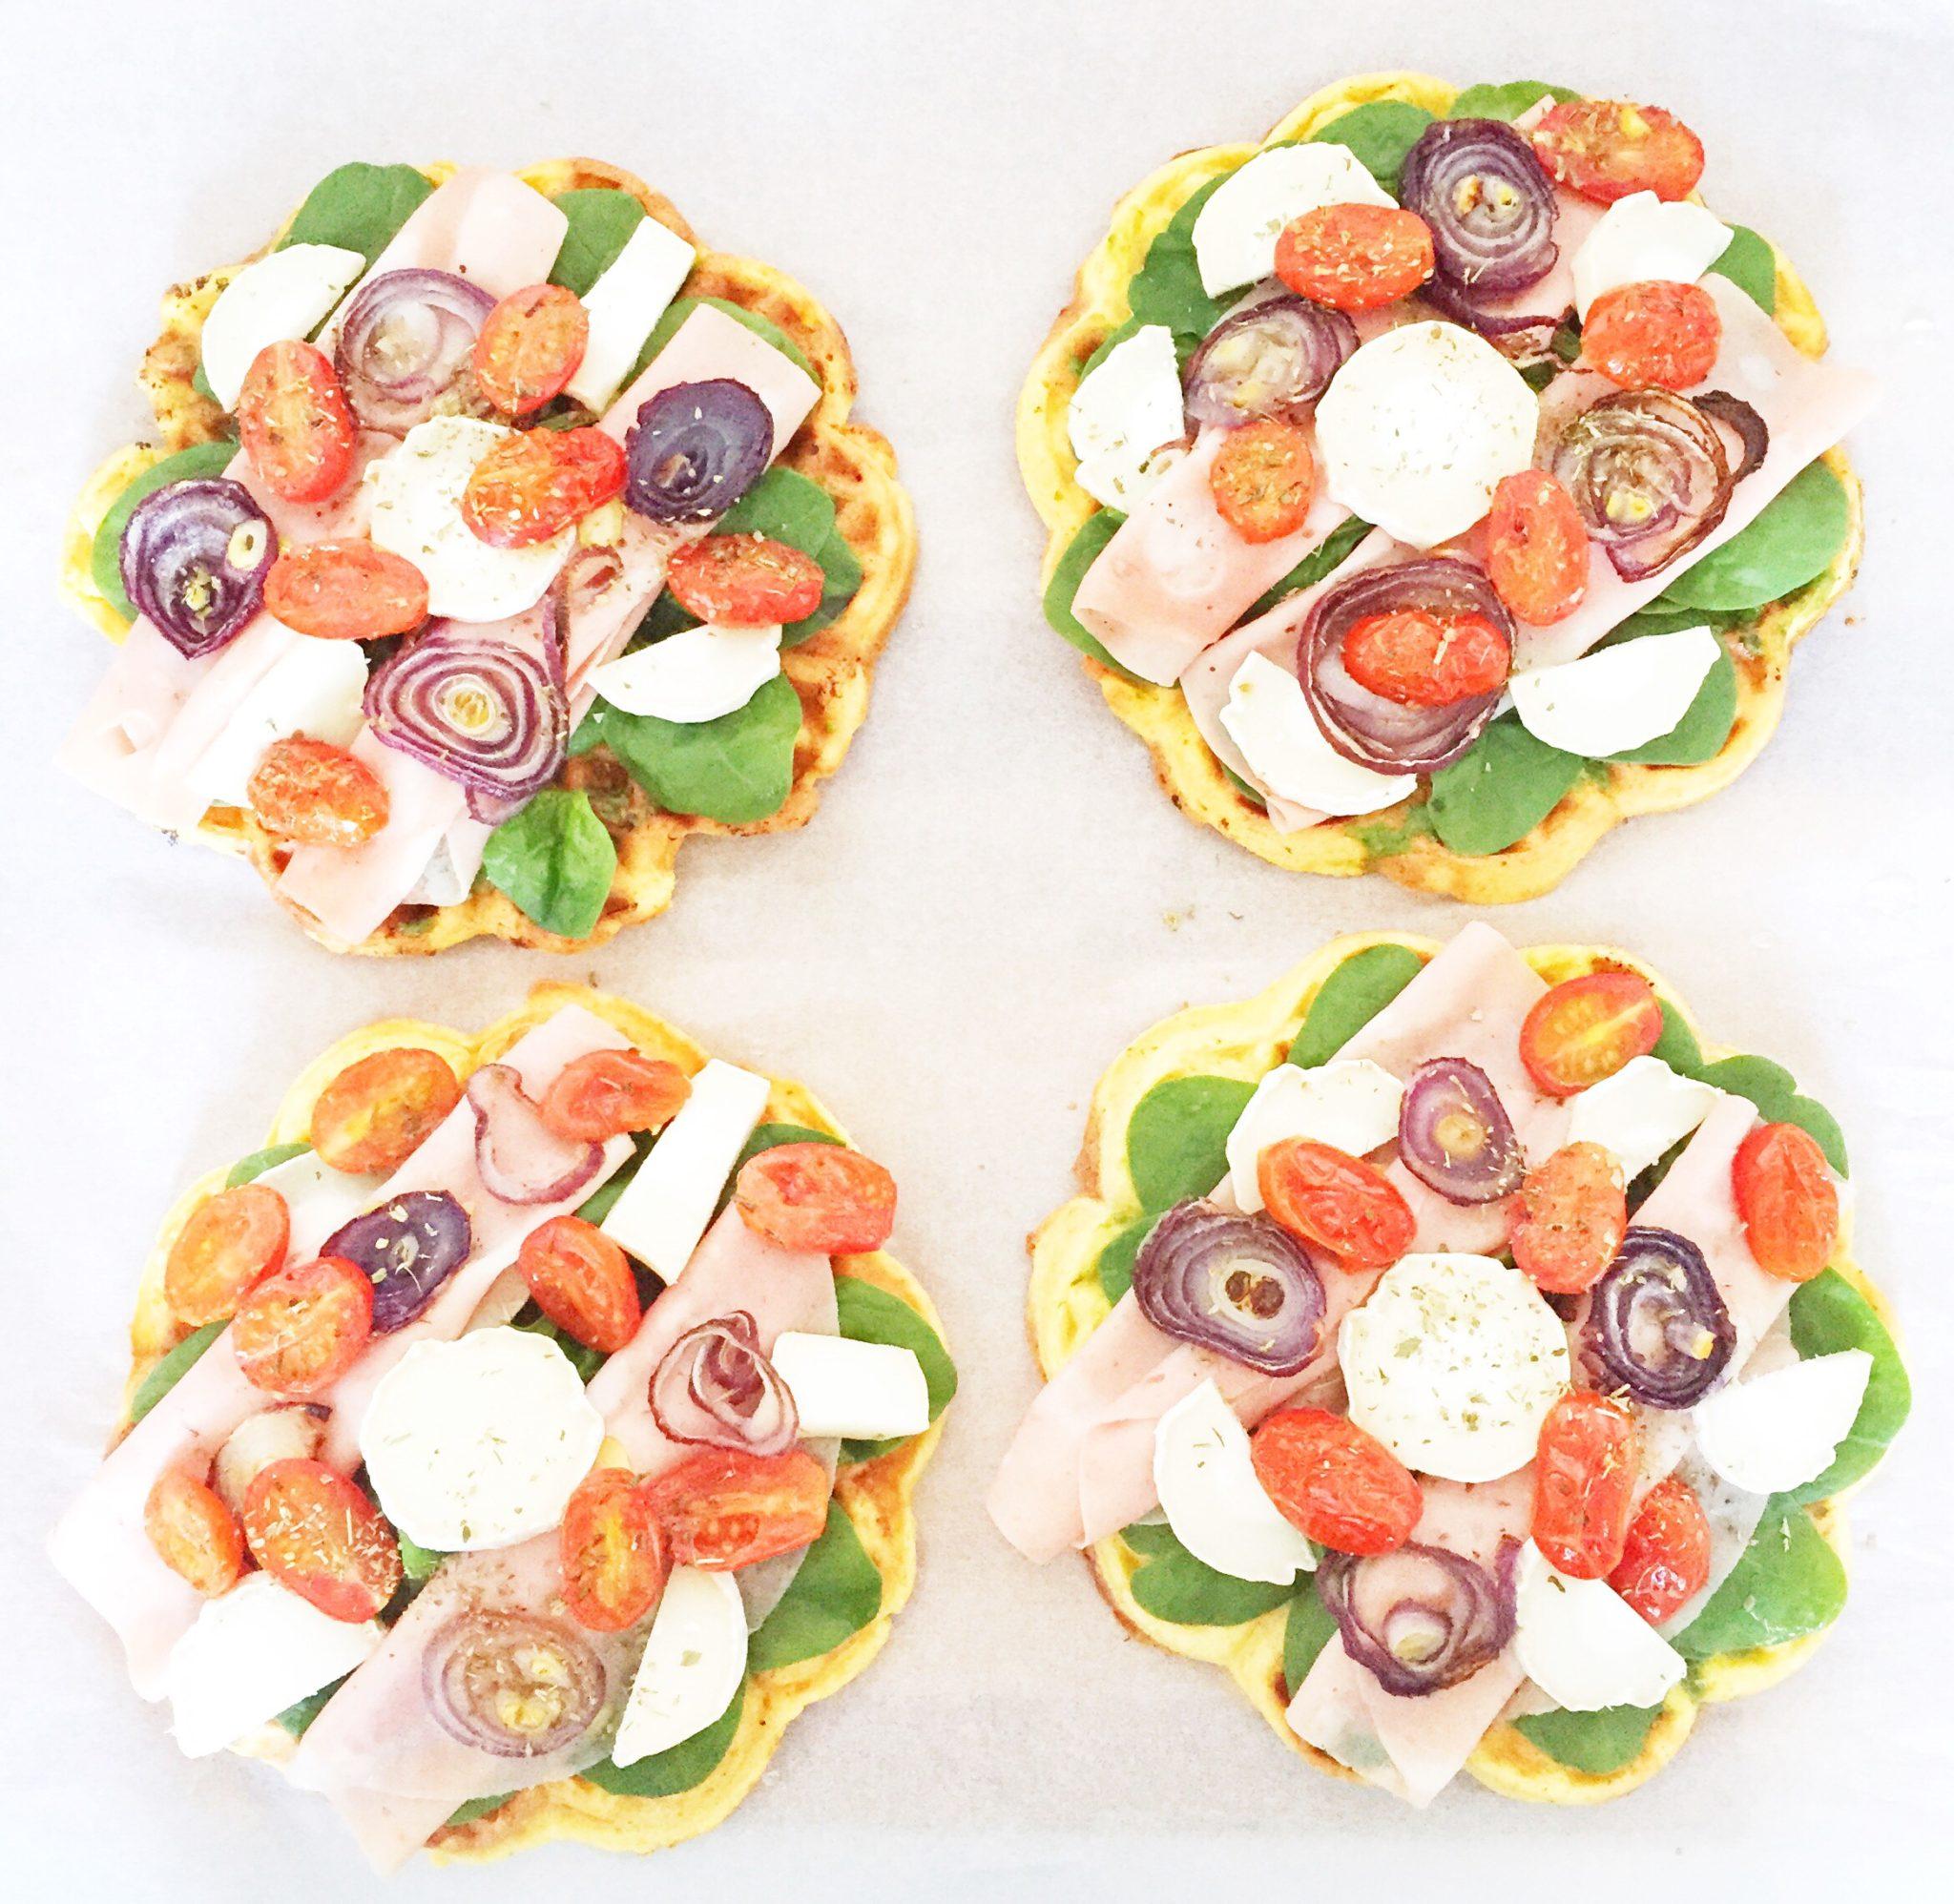 Vaffelpizza